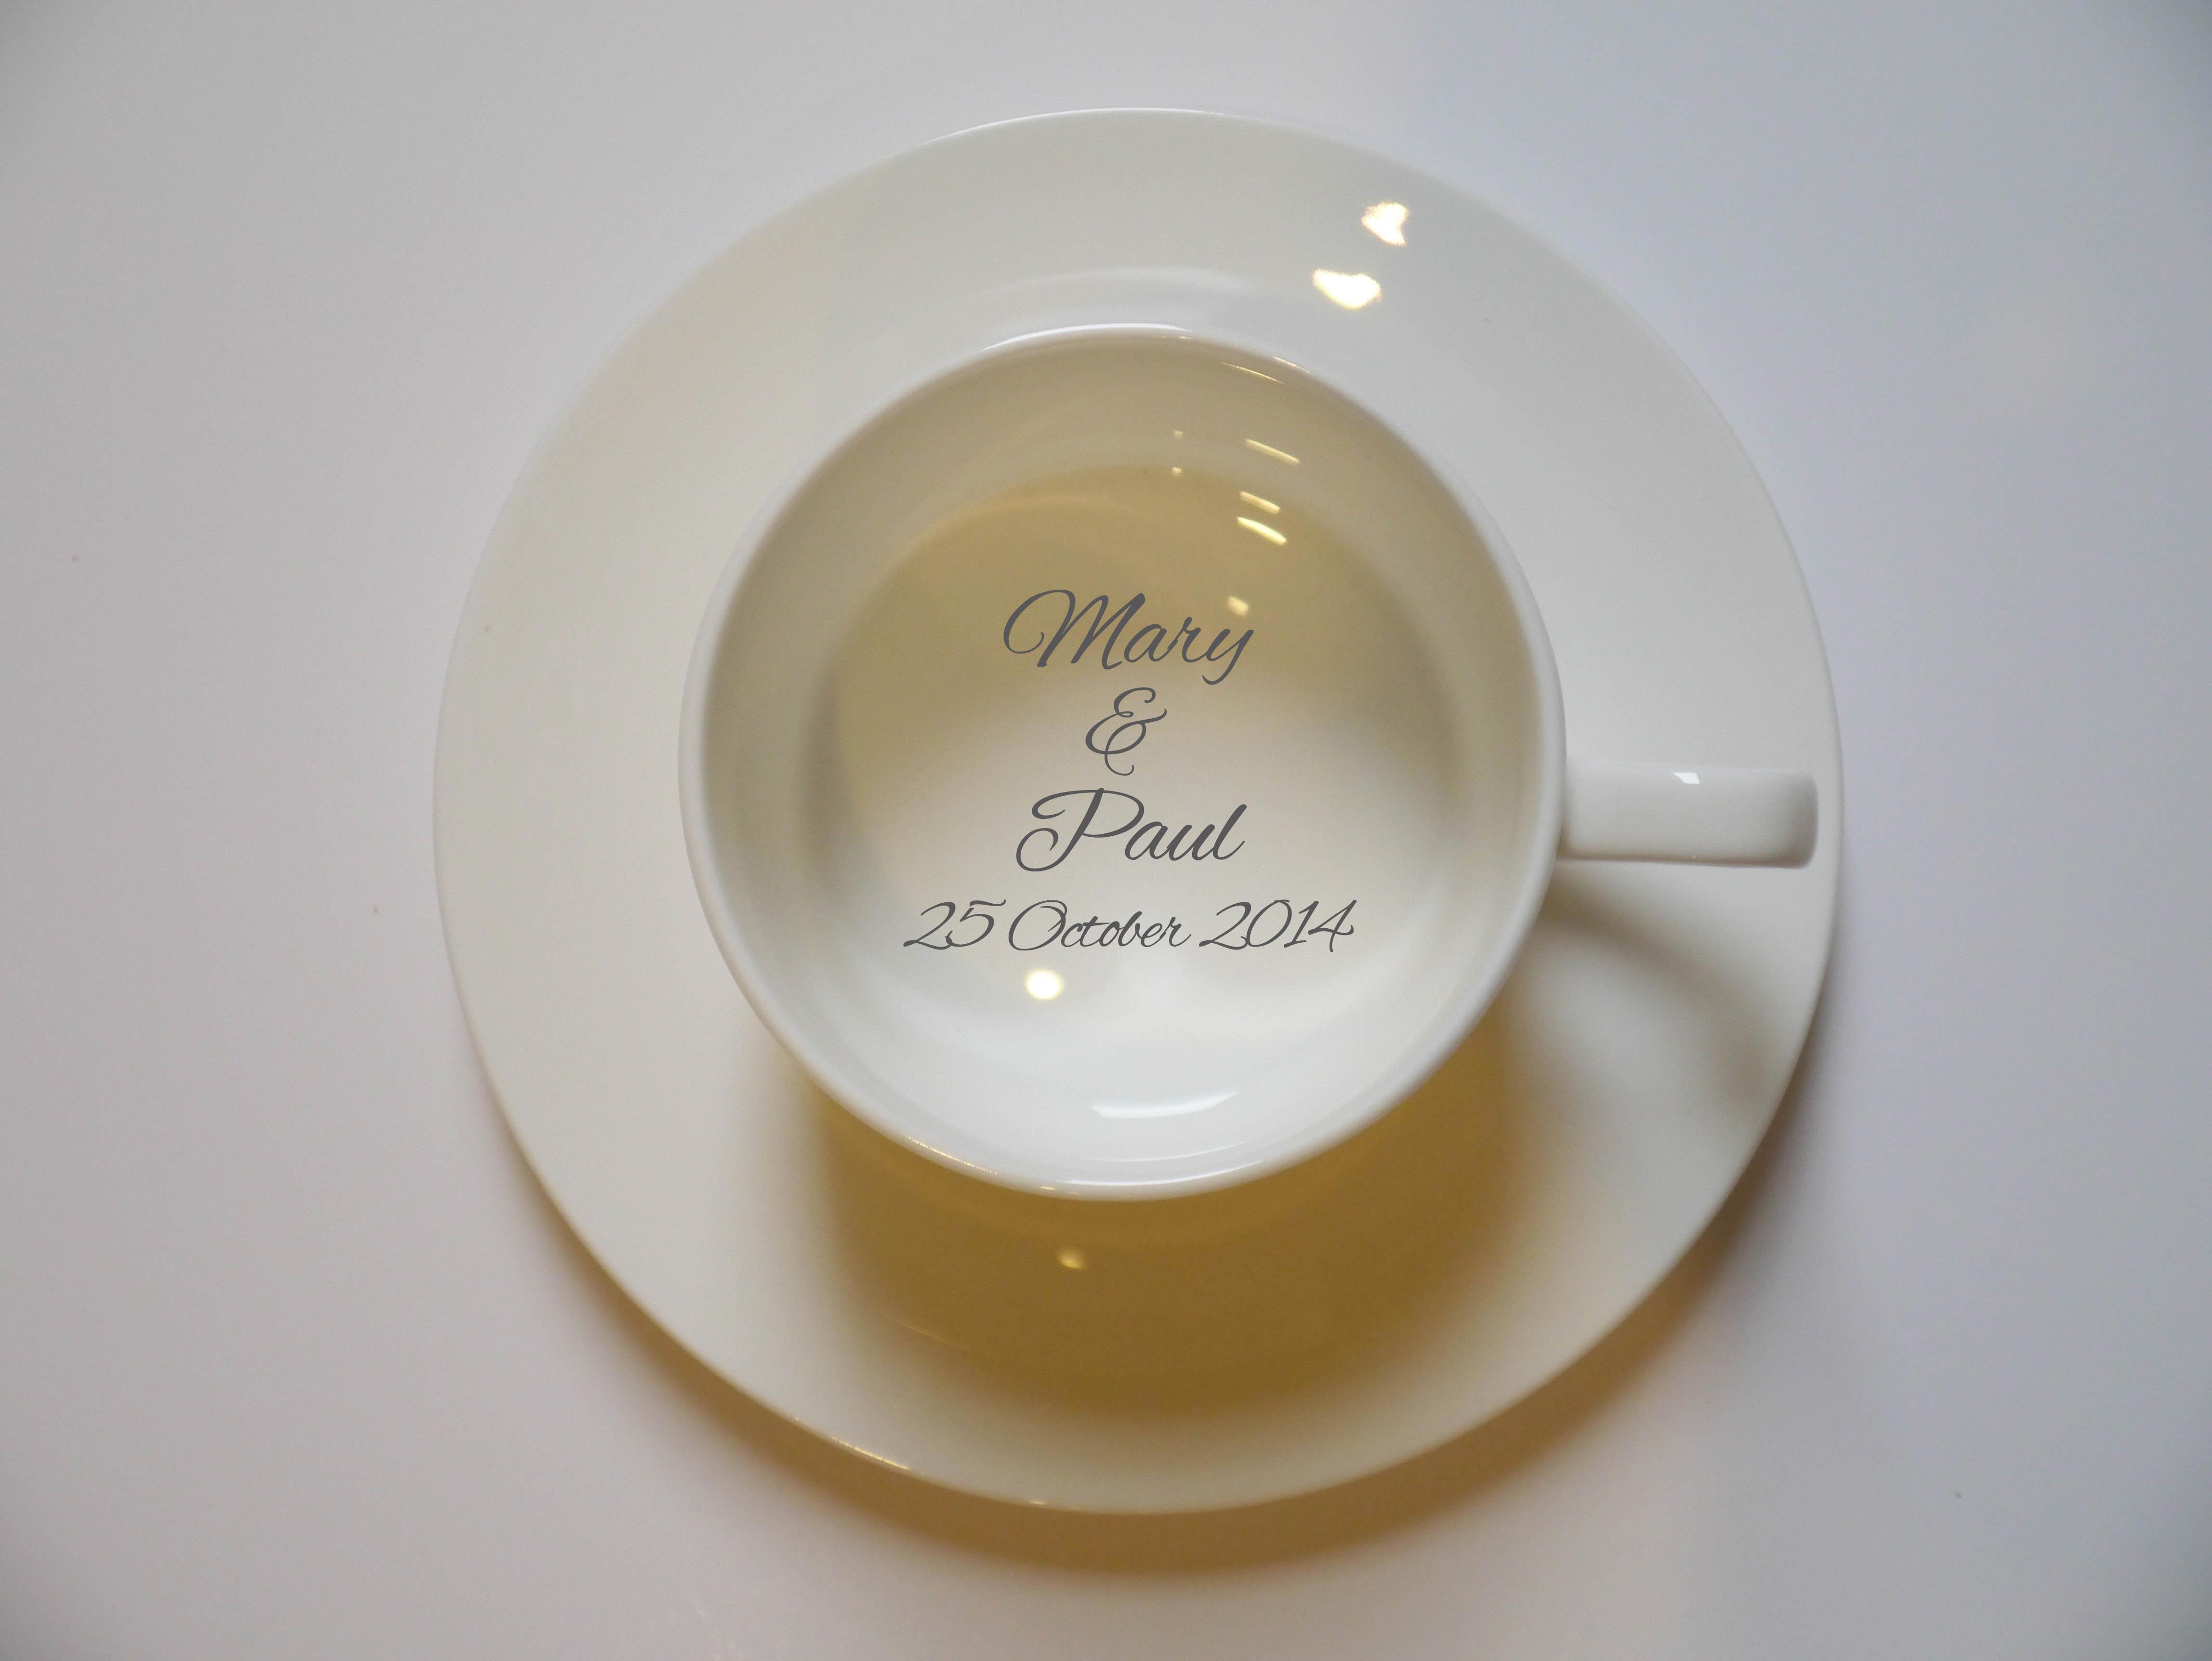 Wedding Favors Tea Cups | Giftwedding.co